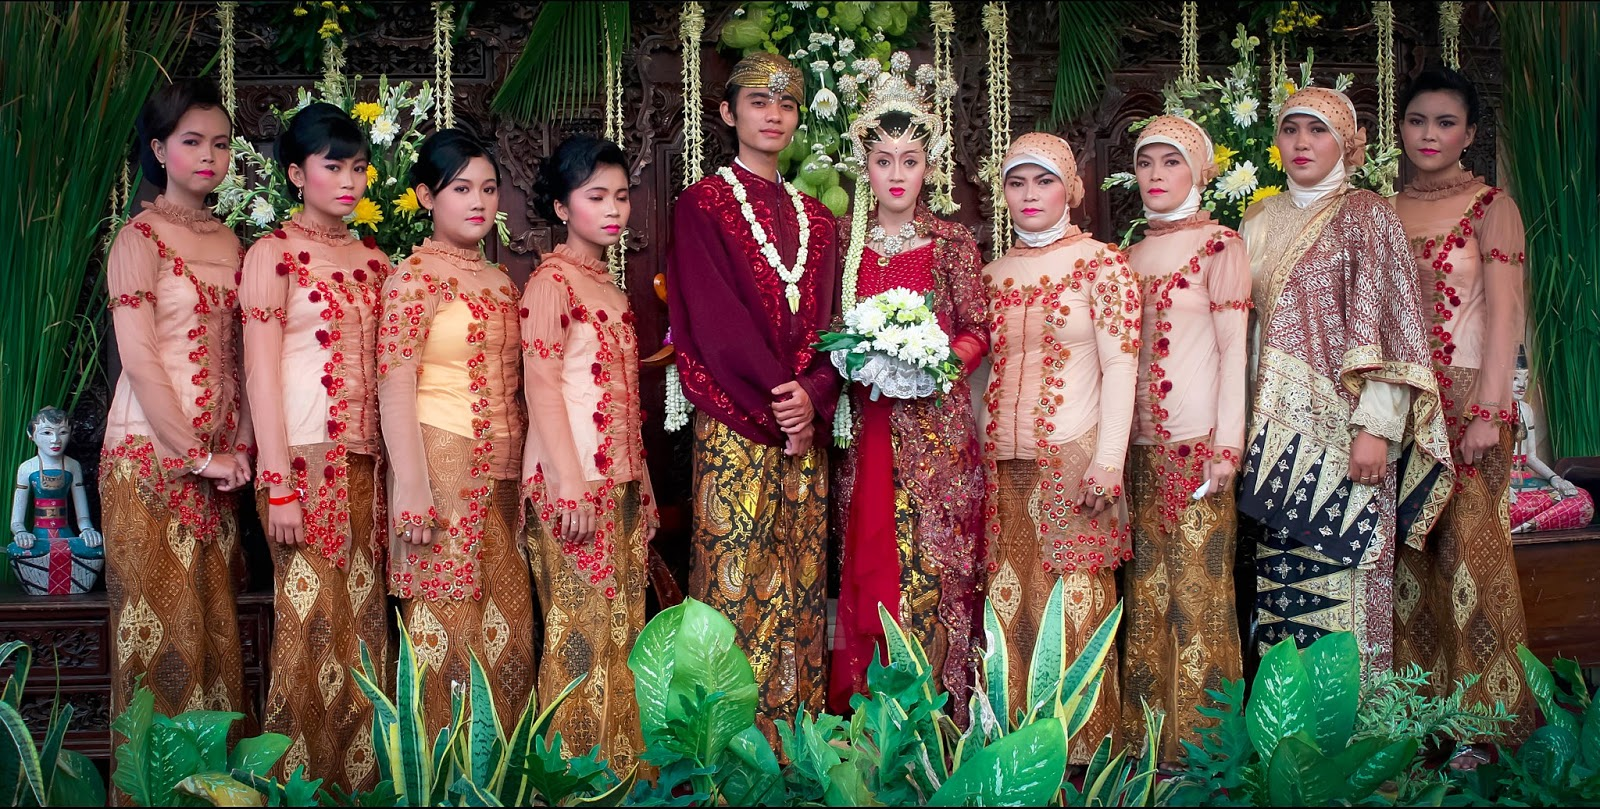 Lihat Fotografer Surabaya Prewedding Dokumentasi Wedding: Jasa Foto Pernikahan Murah Surabaya